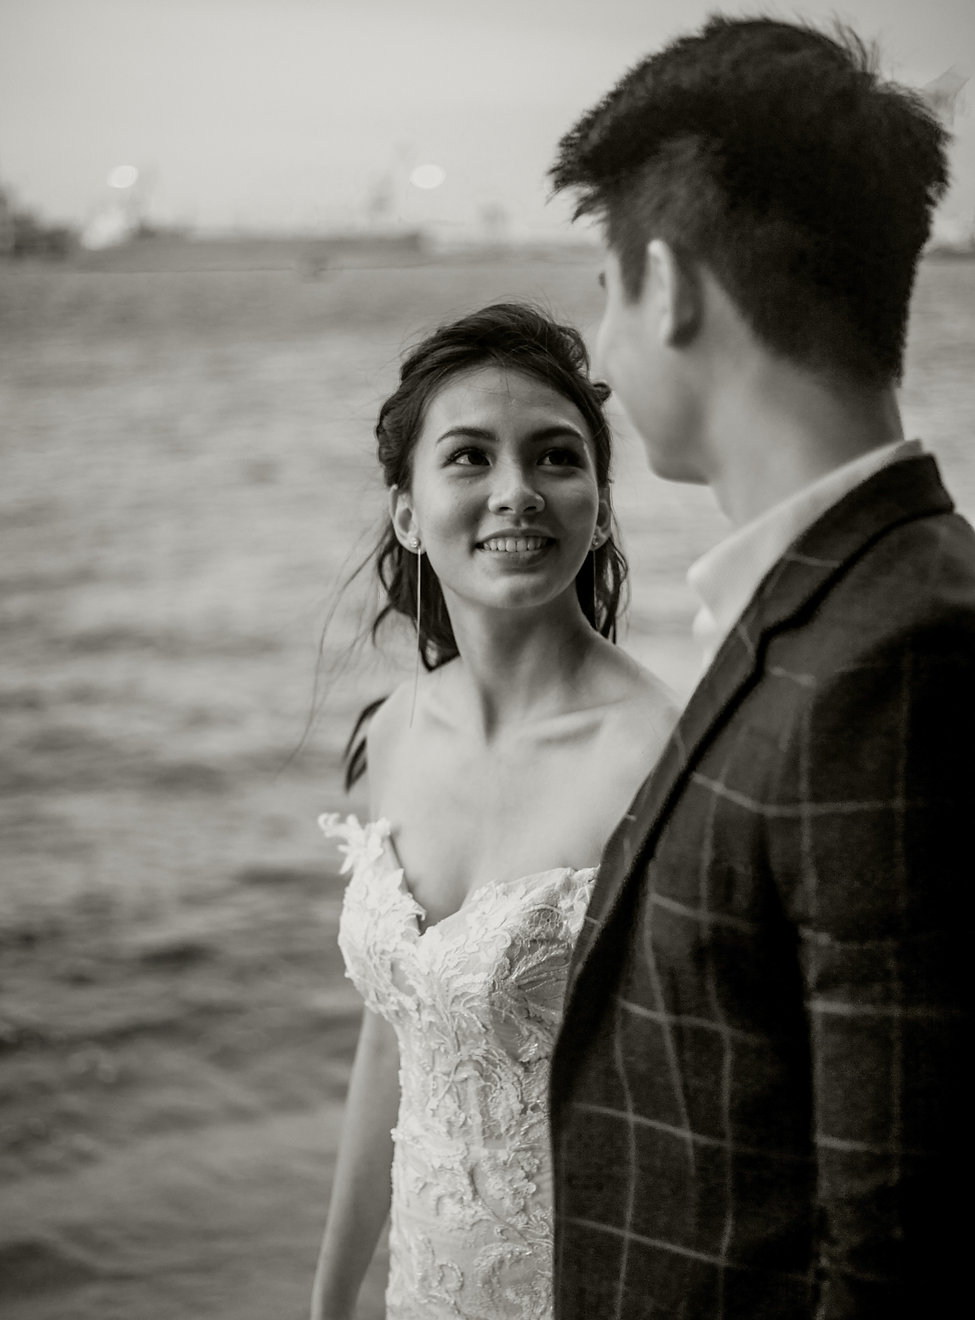 Black and white monochrome wedding photography